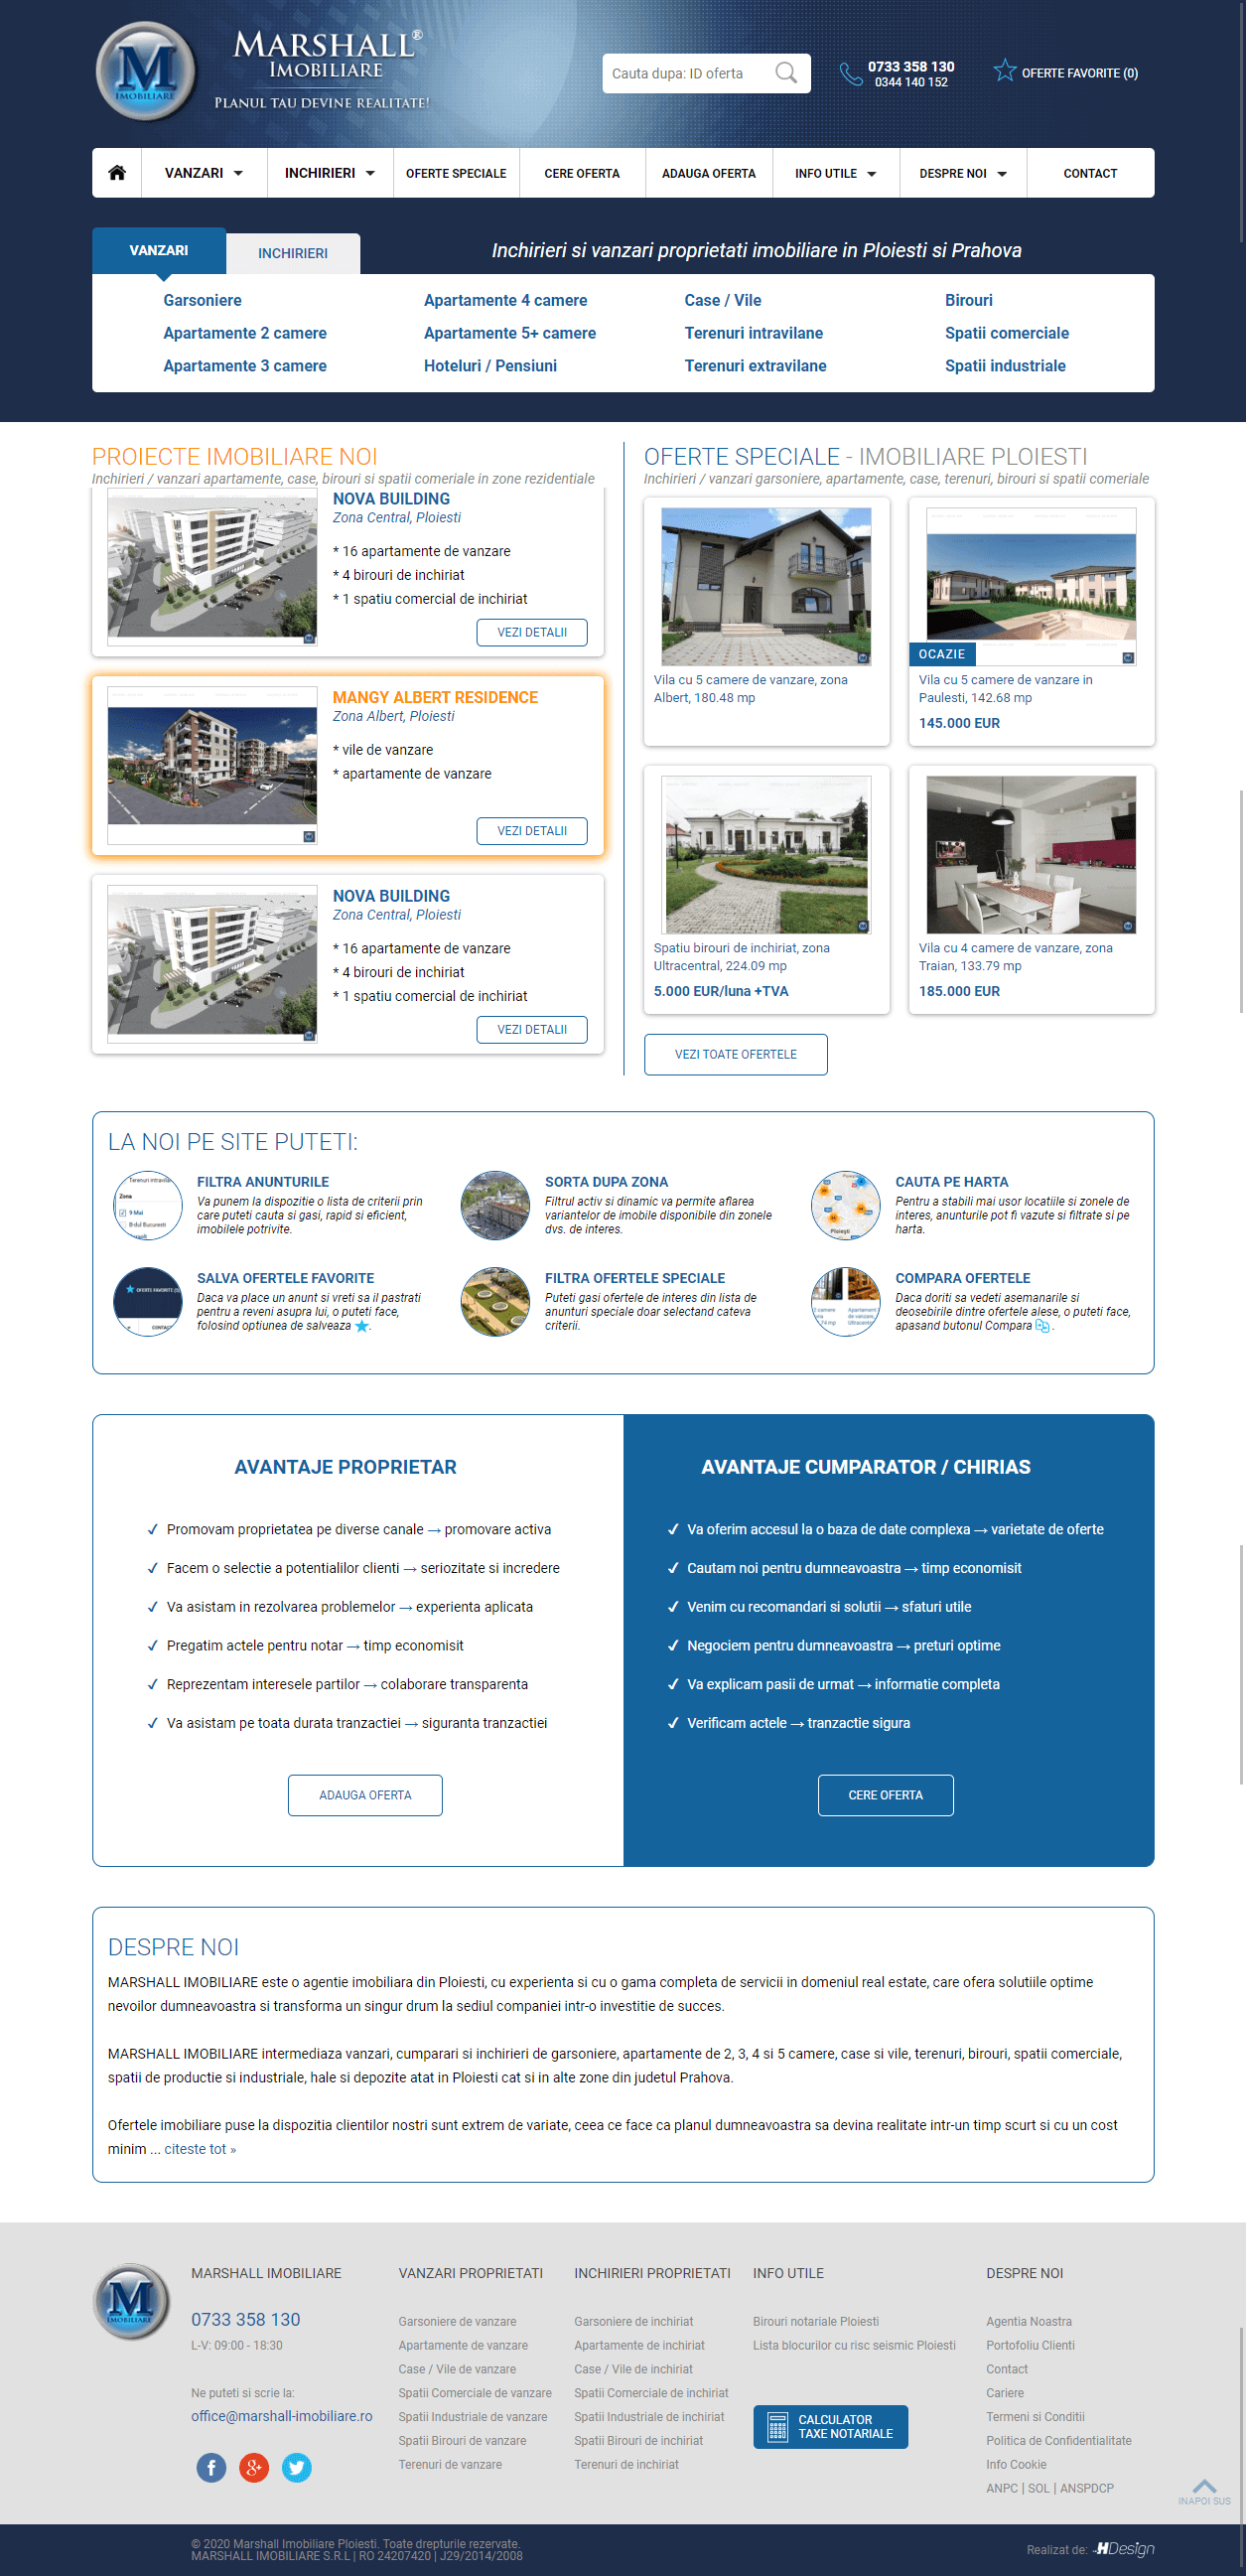 Marshall Imobiliare